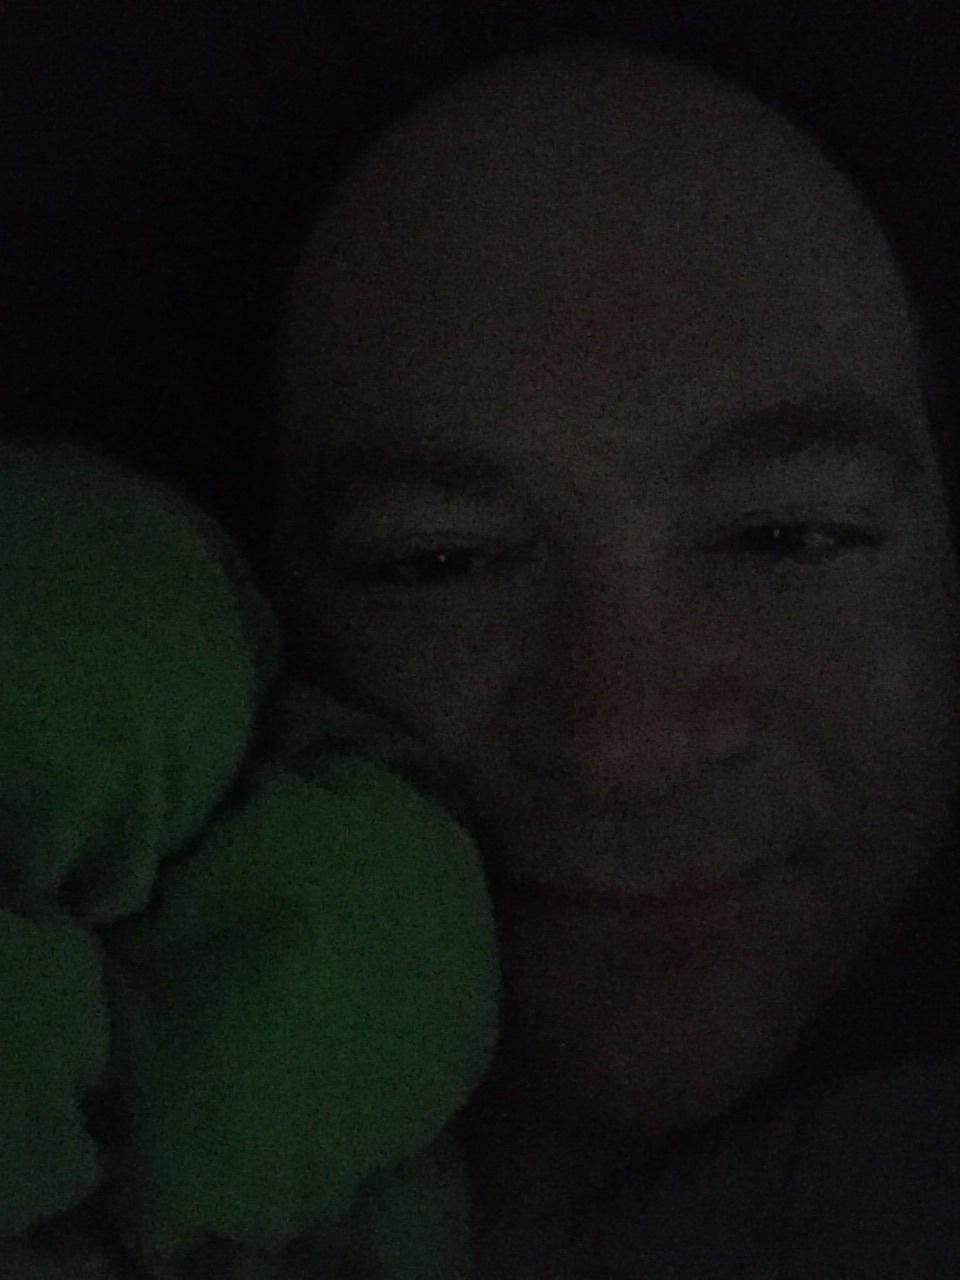 Mako-kun cuddling with Broccoli